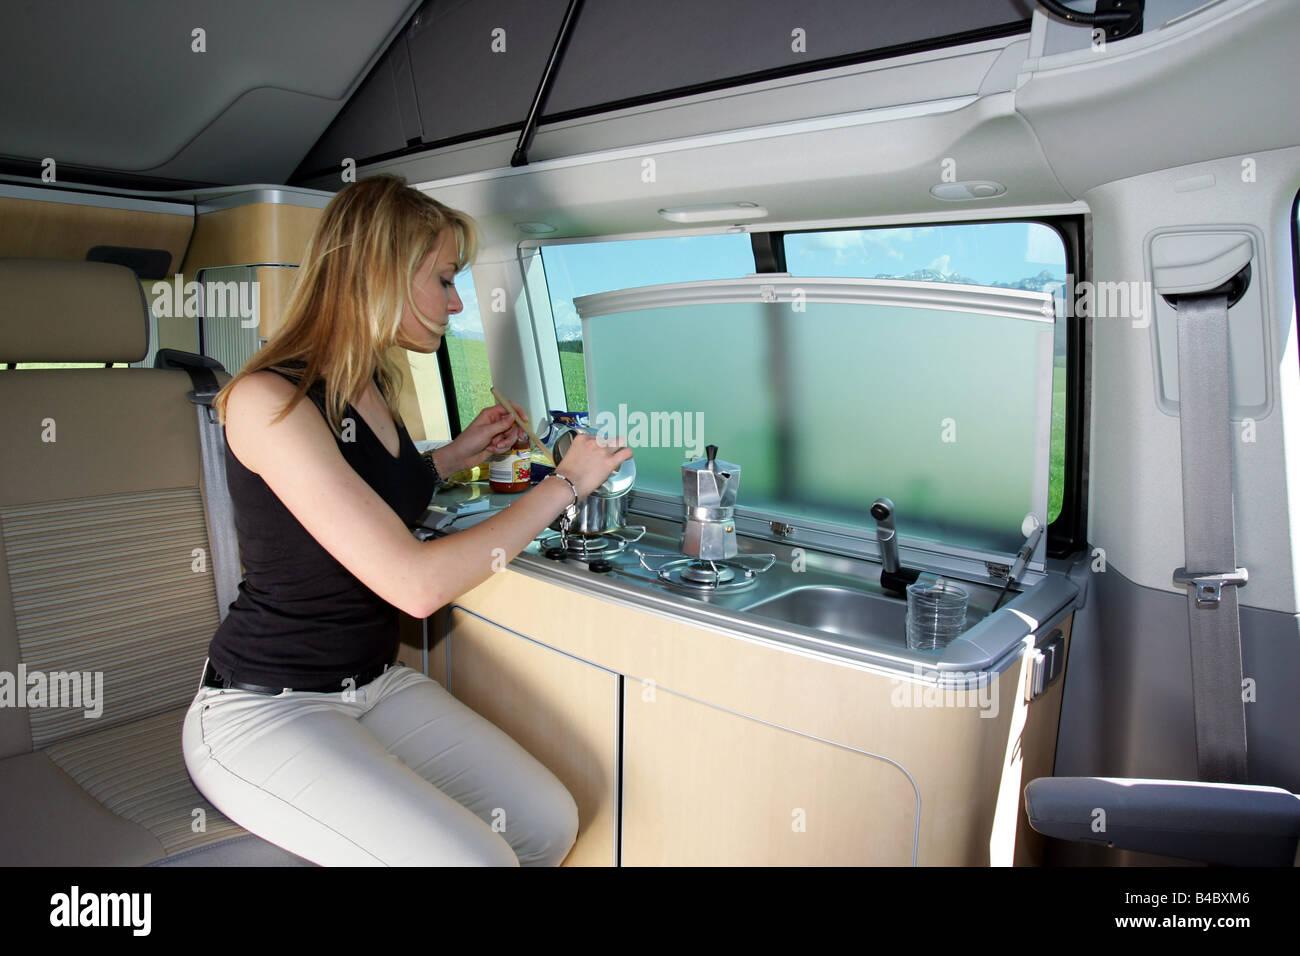 Vw Bus 2018 Interior >> Car, Mercedes Viano CDI 2.2 Marco Polo, Minibus, Camper, Campsite Stock Photo, Royalty Free ...